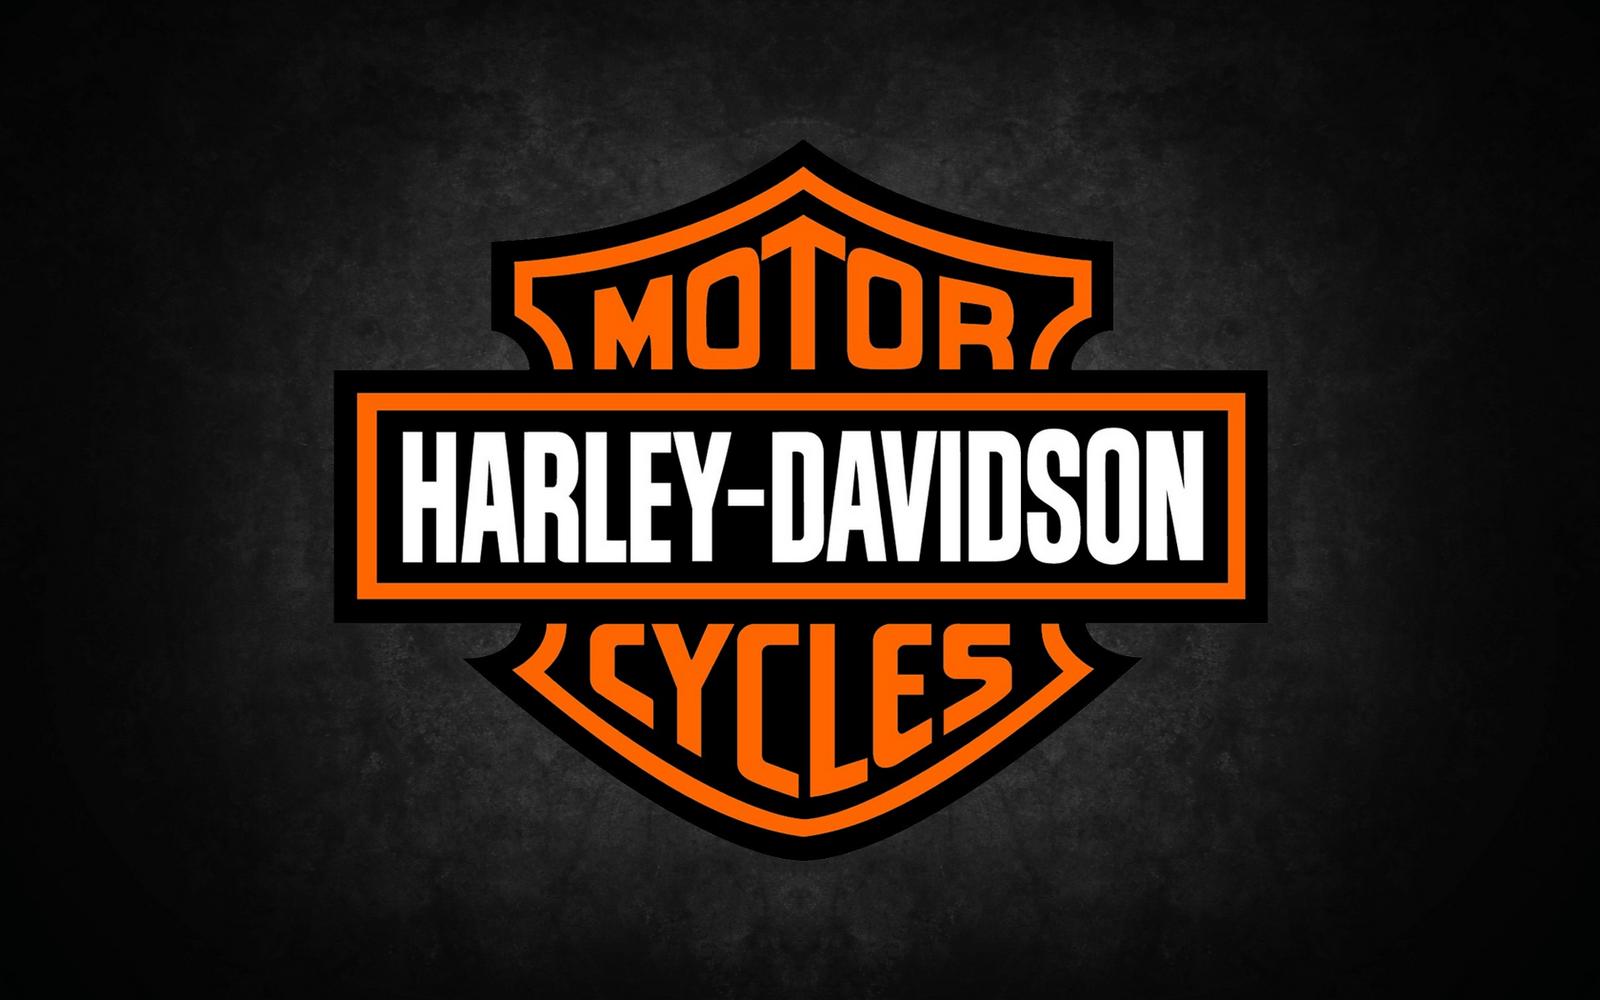 Harley Davidson Wallpapers - Wallpaper - 654.7KB